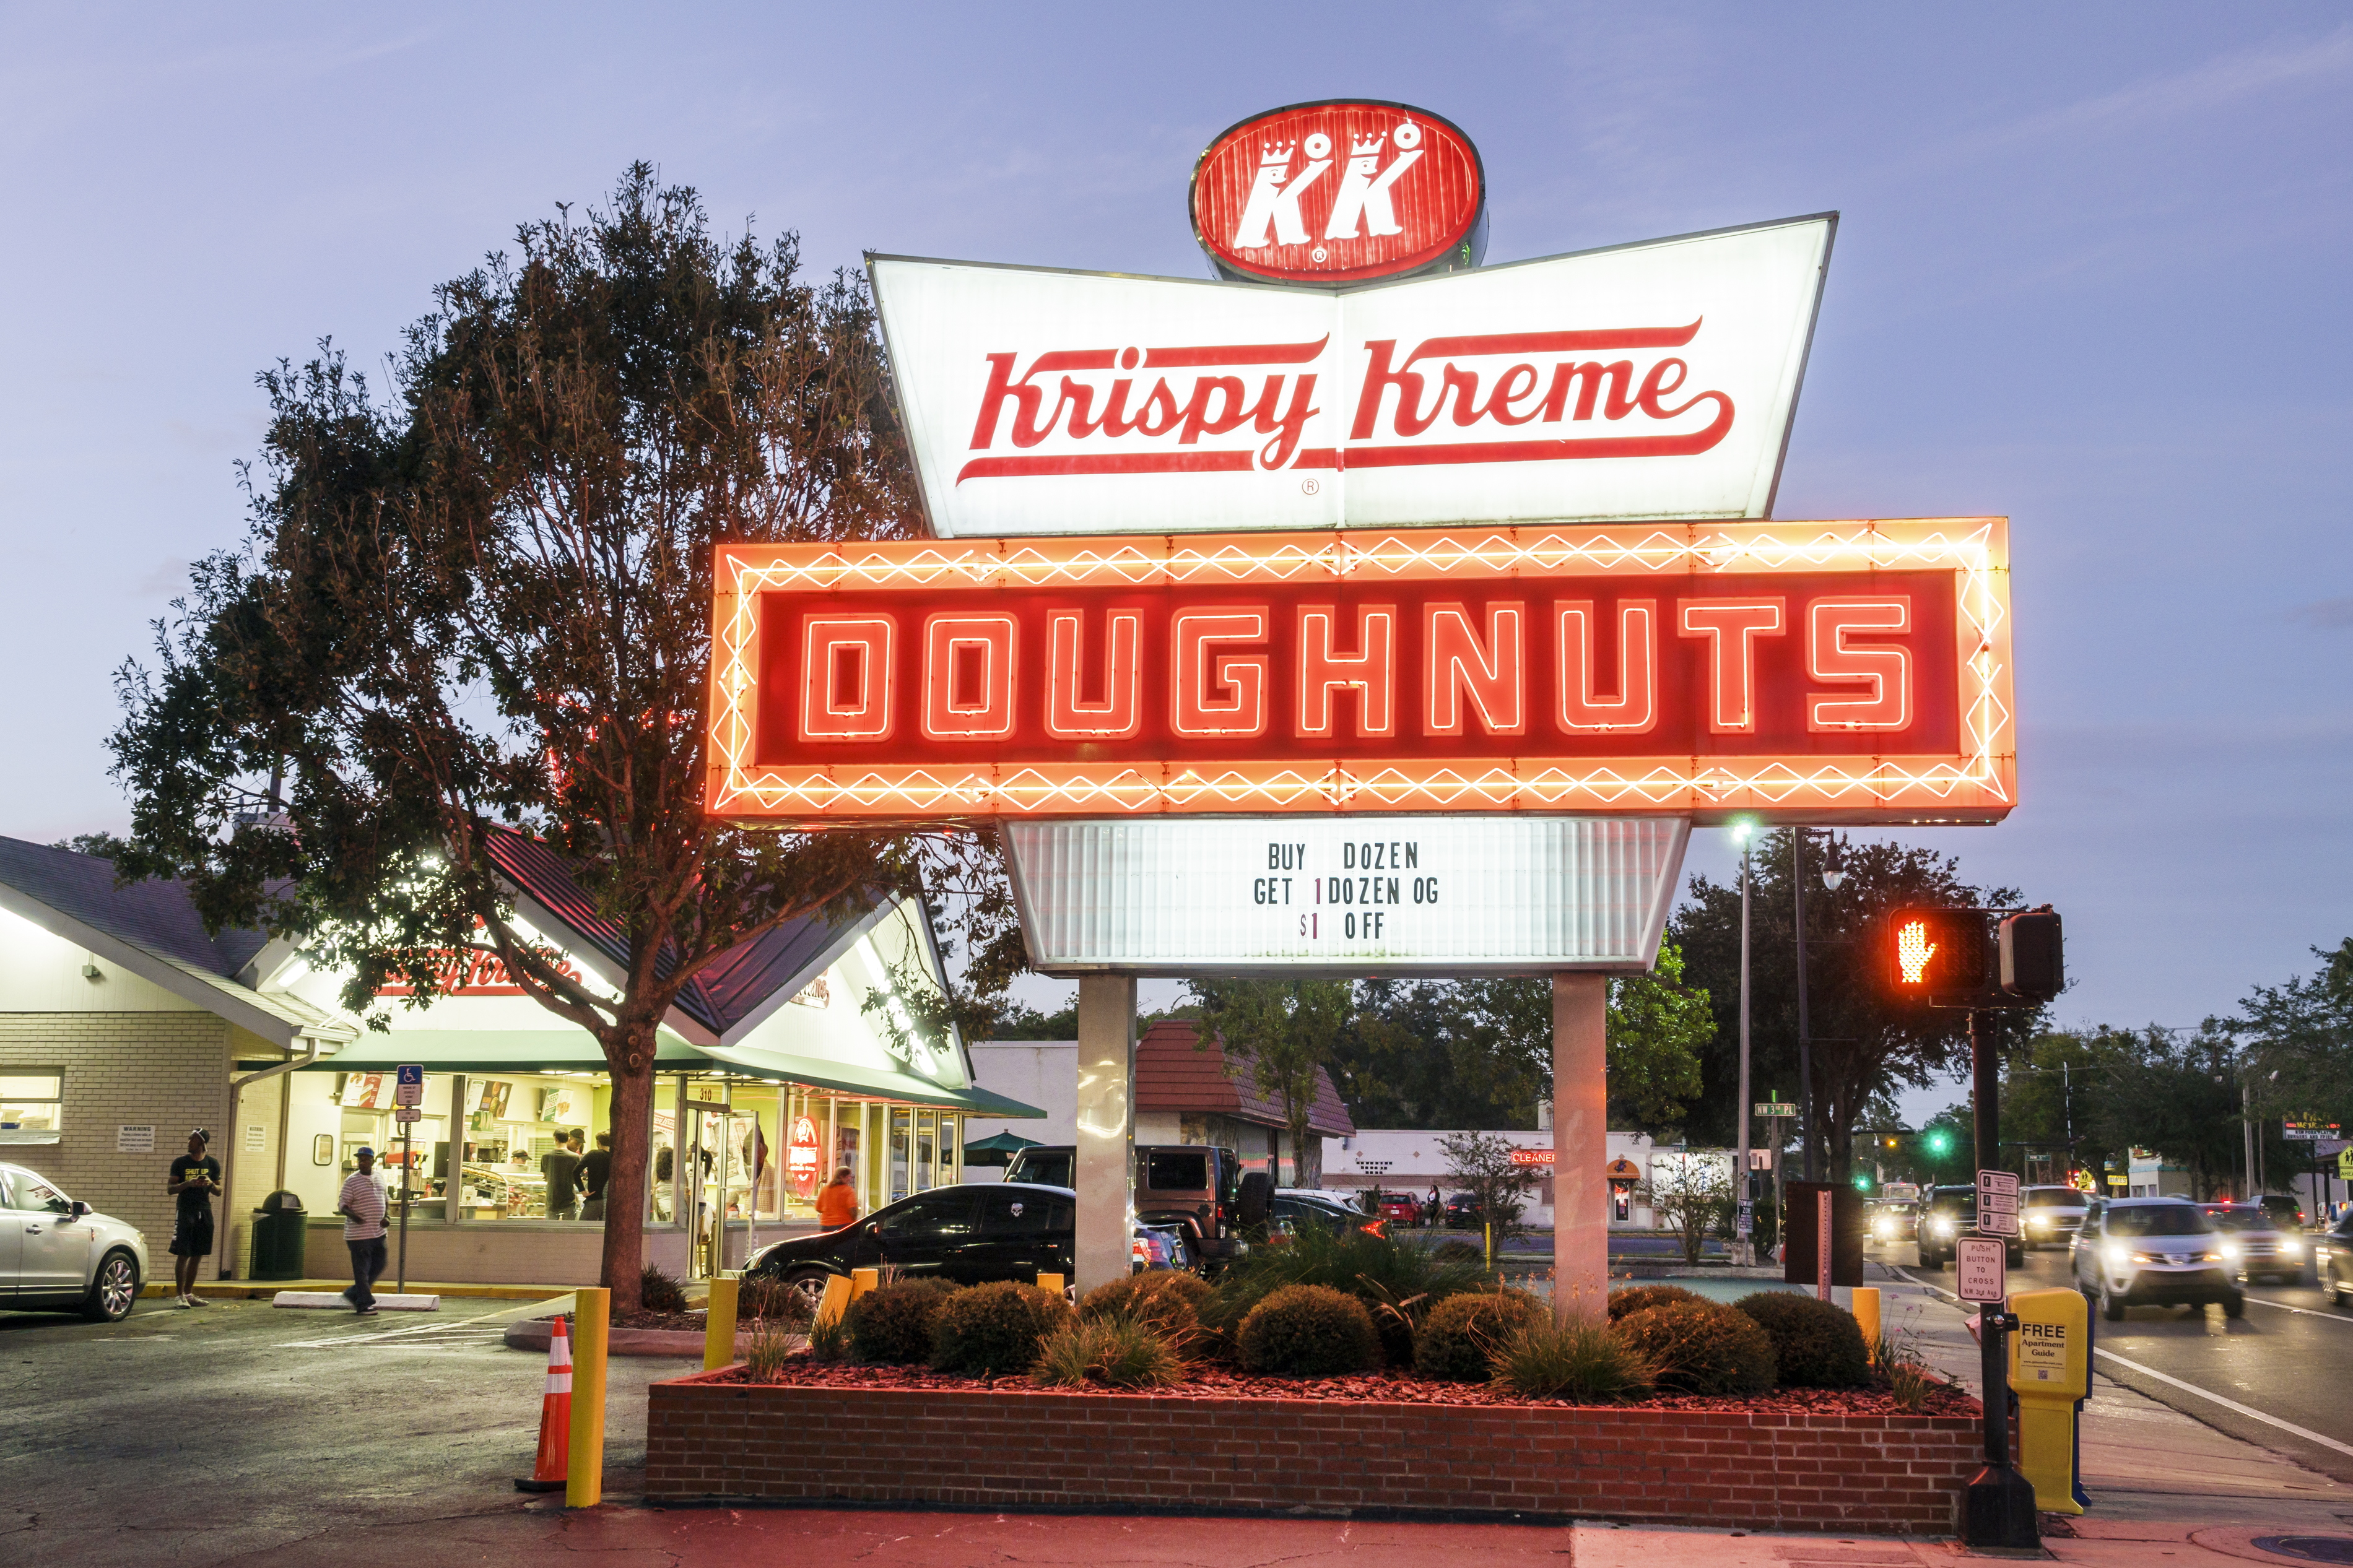 Gainesville, Krispy Kreme Doughnuts. (Photo by: Jeffrey Greenberg/UIG via Getty Images)